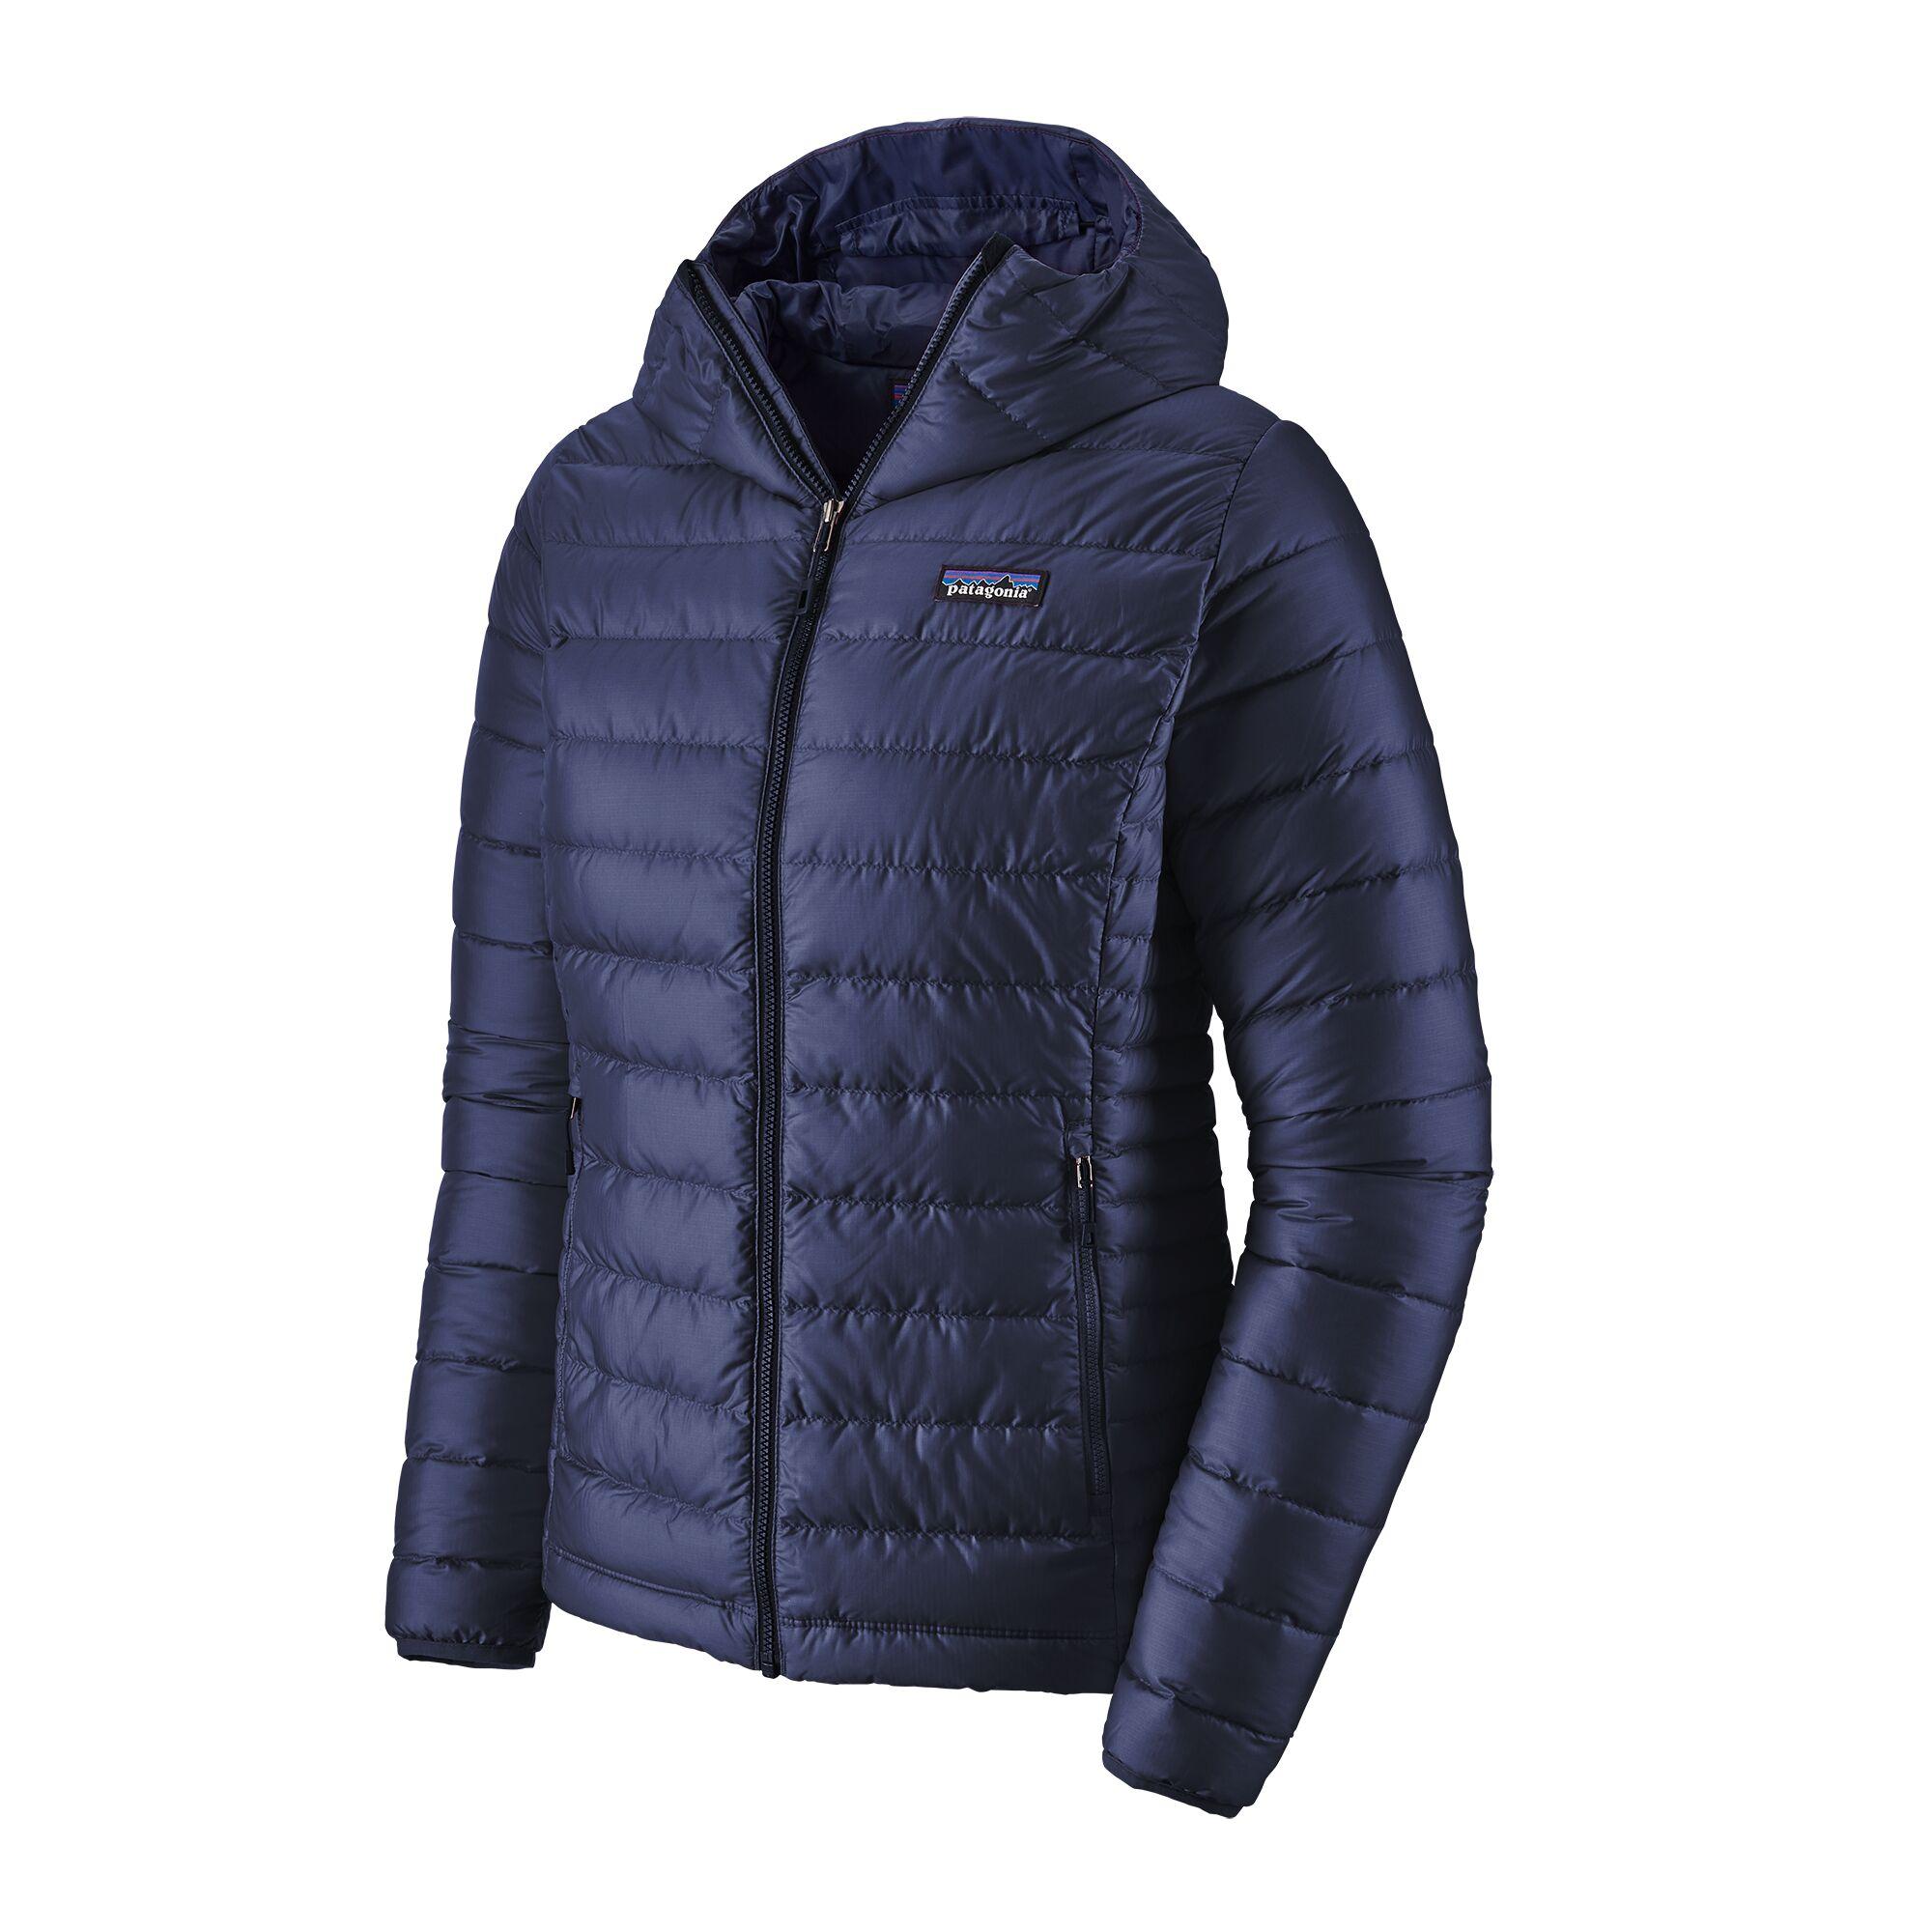 Patagonia - Down Sweater Hoody - Down jacket - Women's